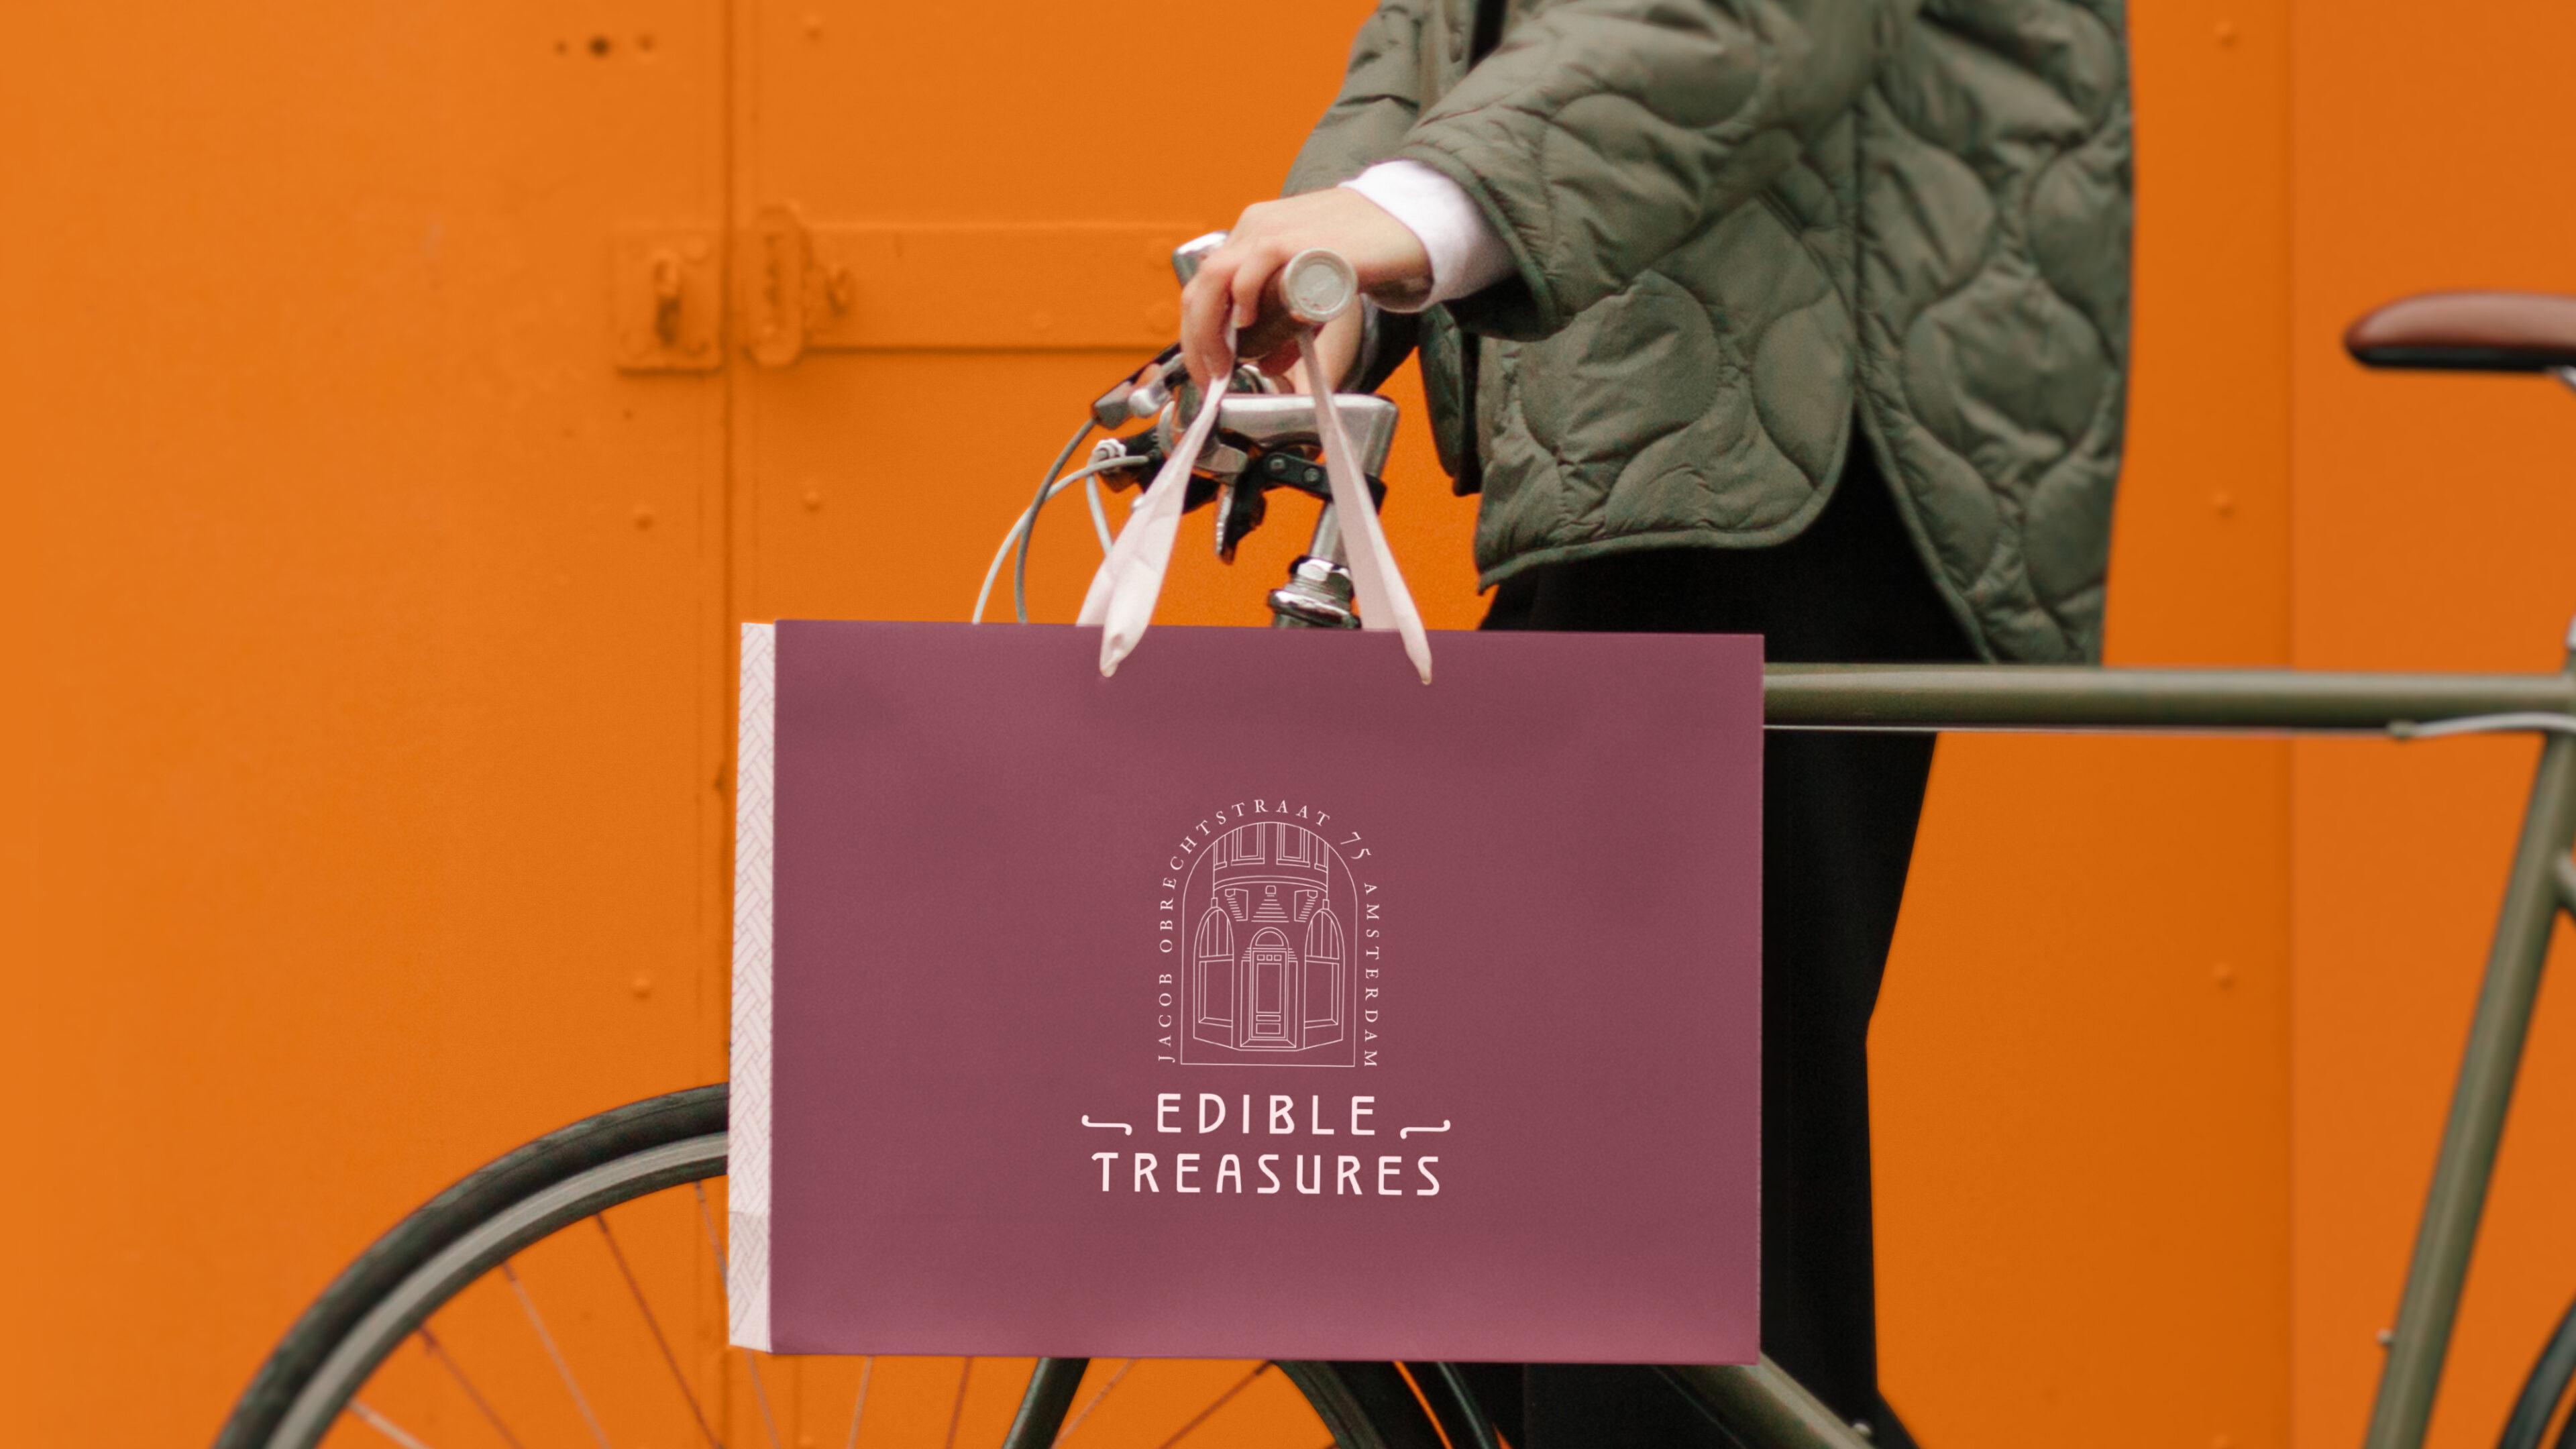 Edible Treasures